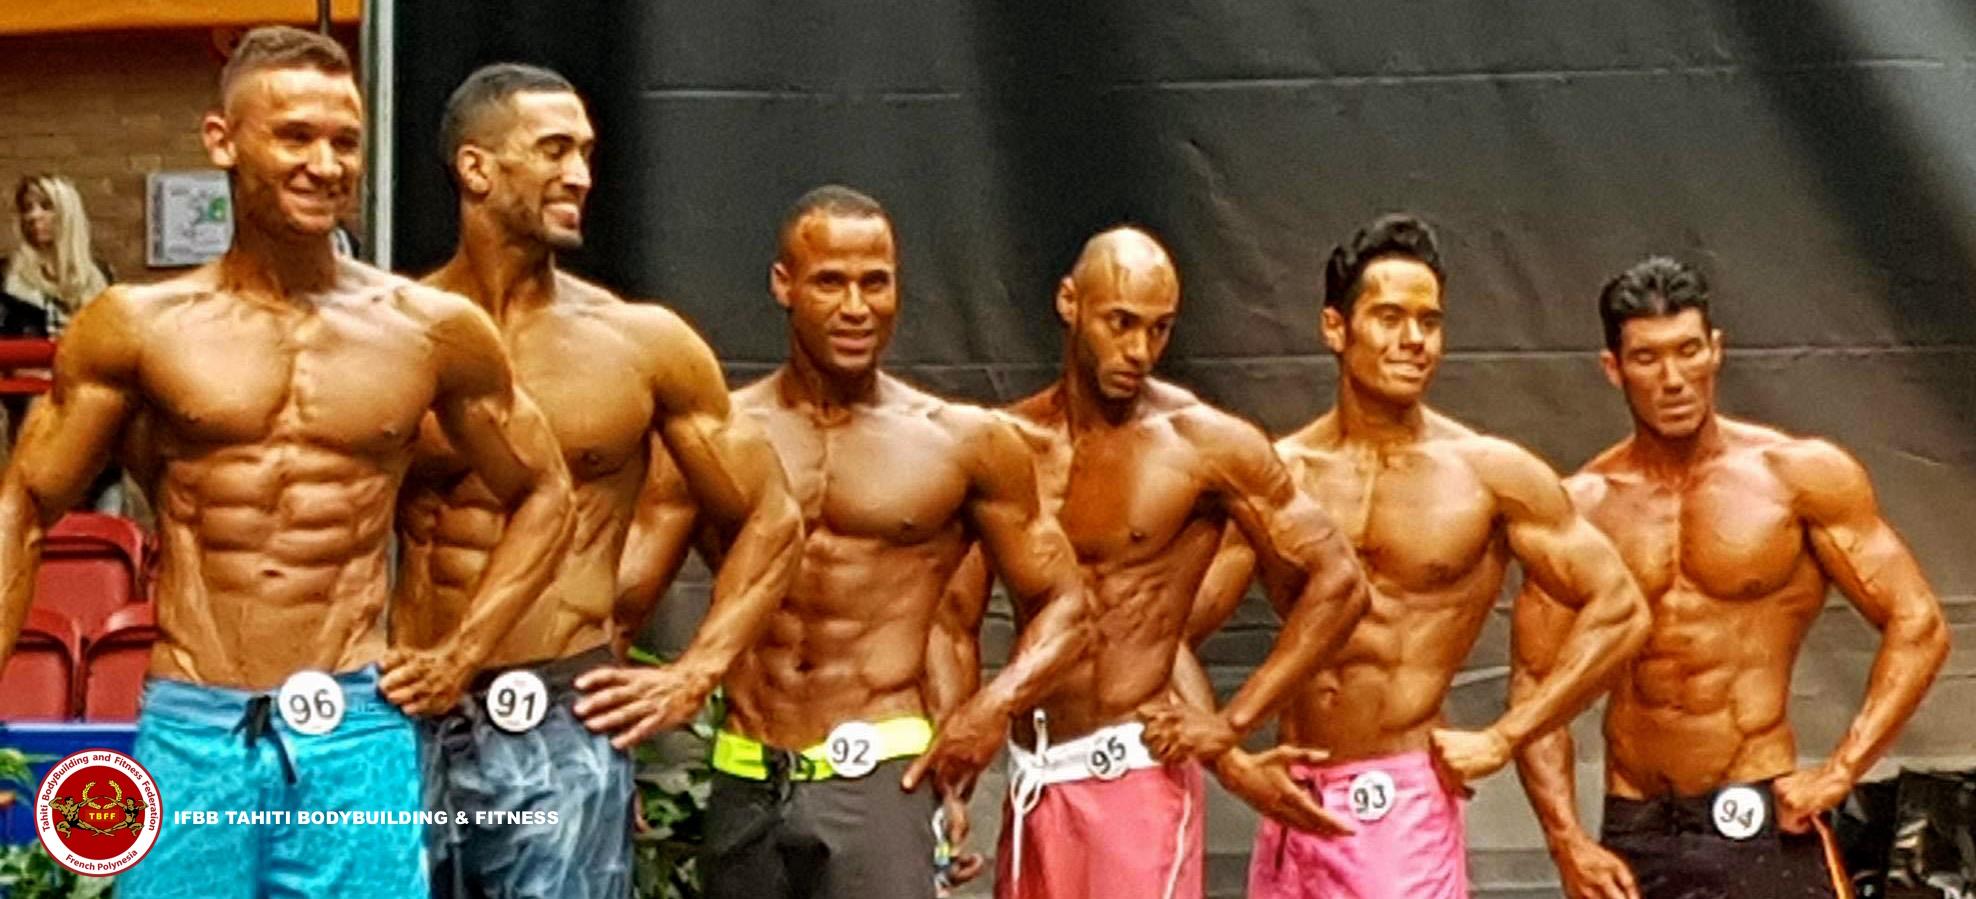 Finales IFBB France 2016